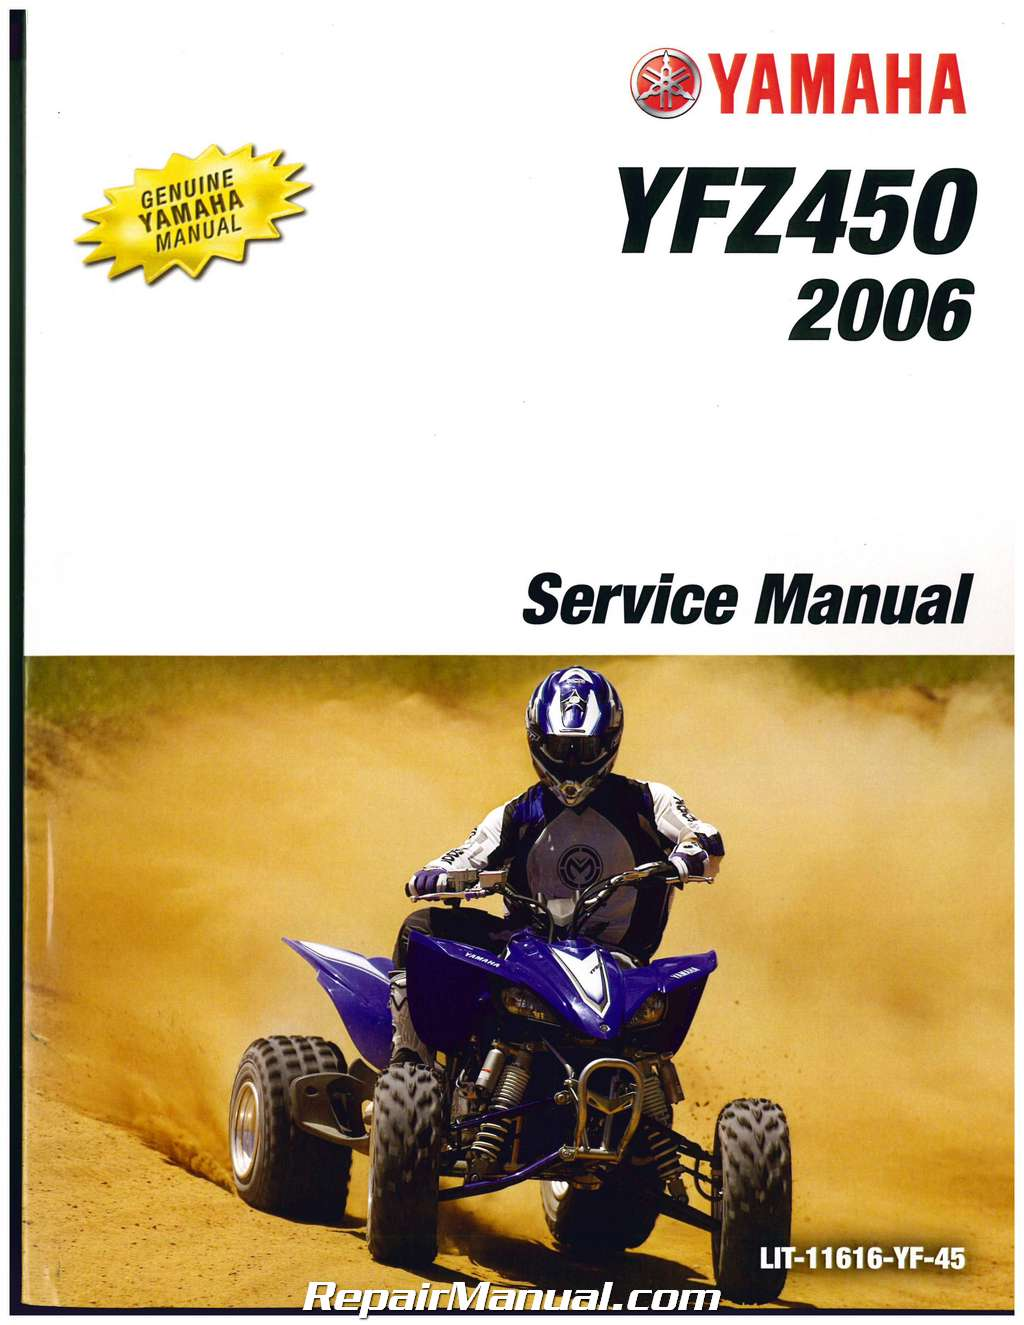 2004 yfz 450 wiring diagram also with yamaha atv 2004